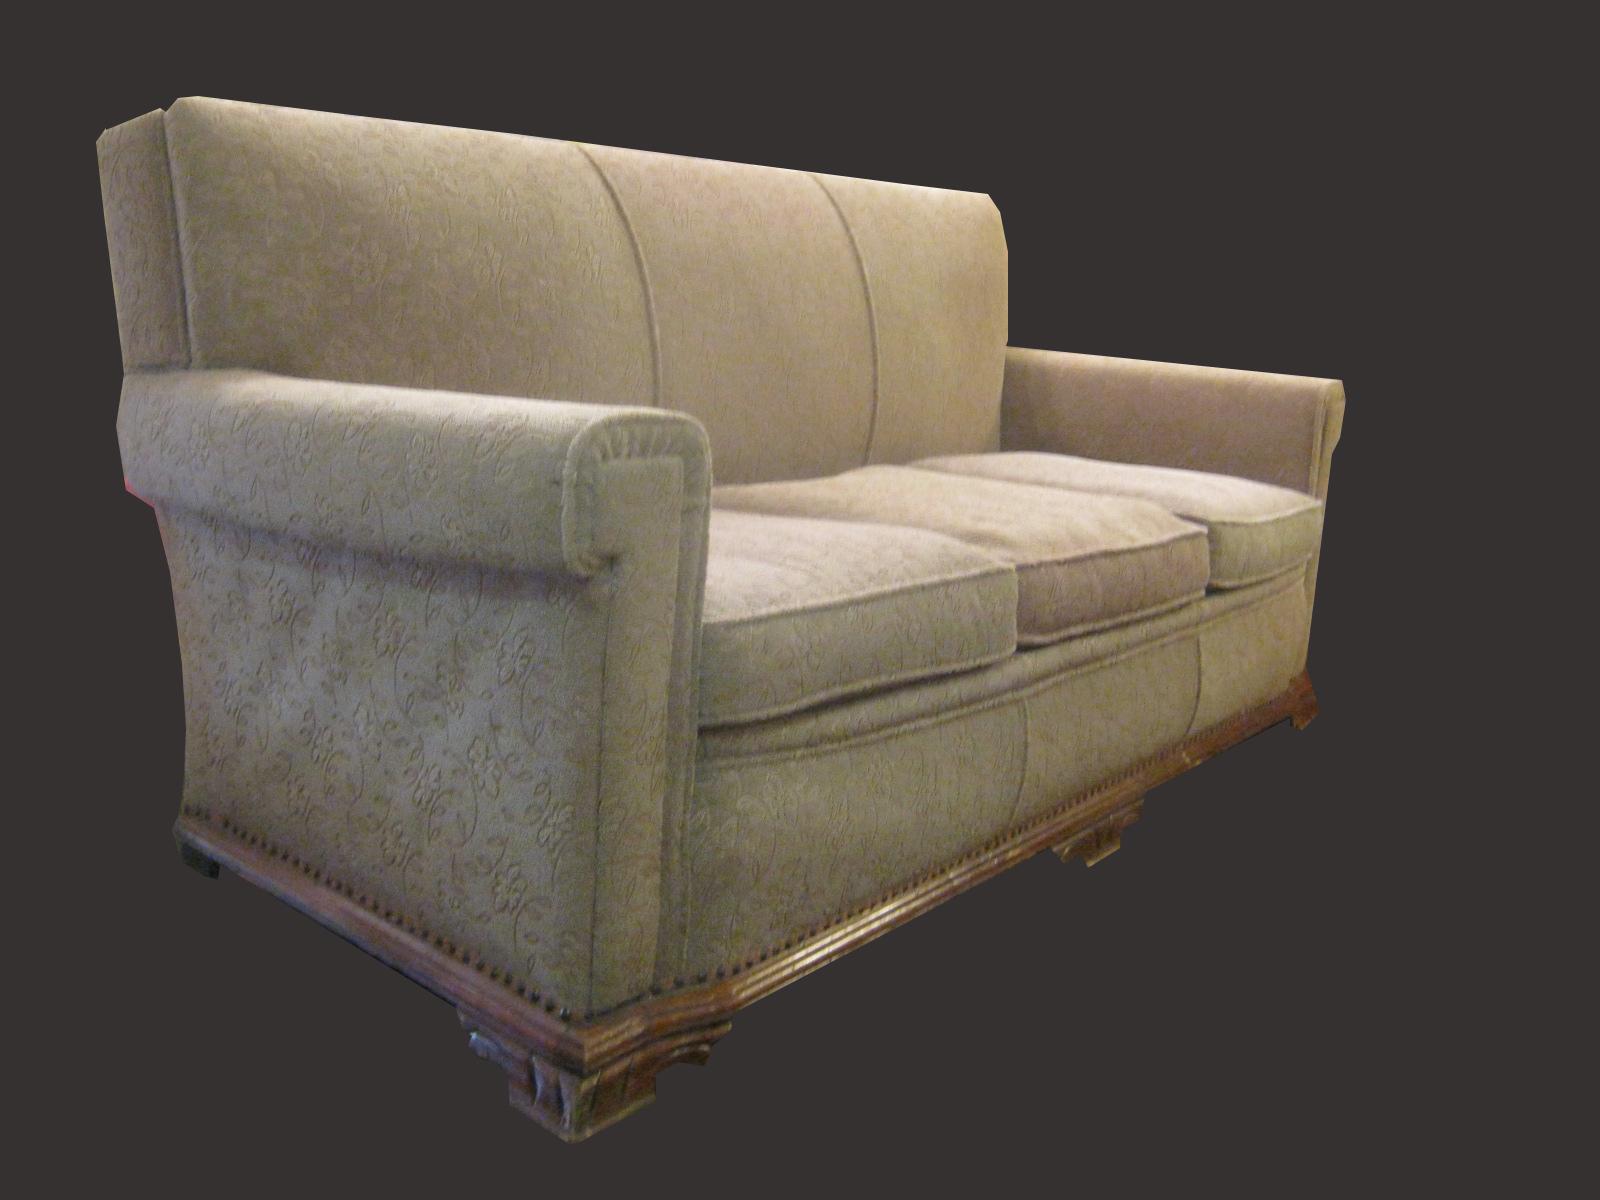 Uhuru Furniture Amp Collectibles Vintage Sofa WMohair